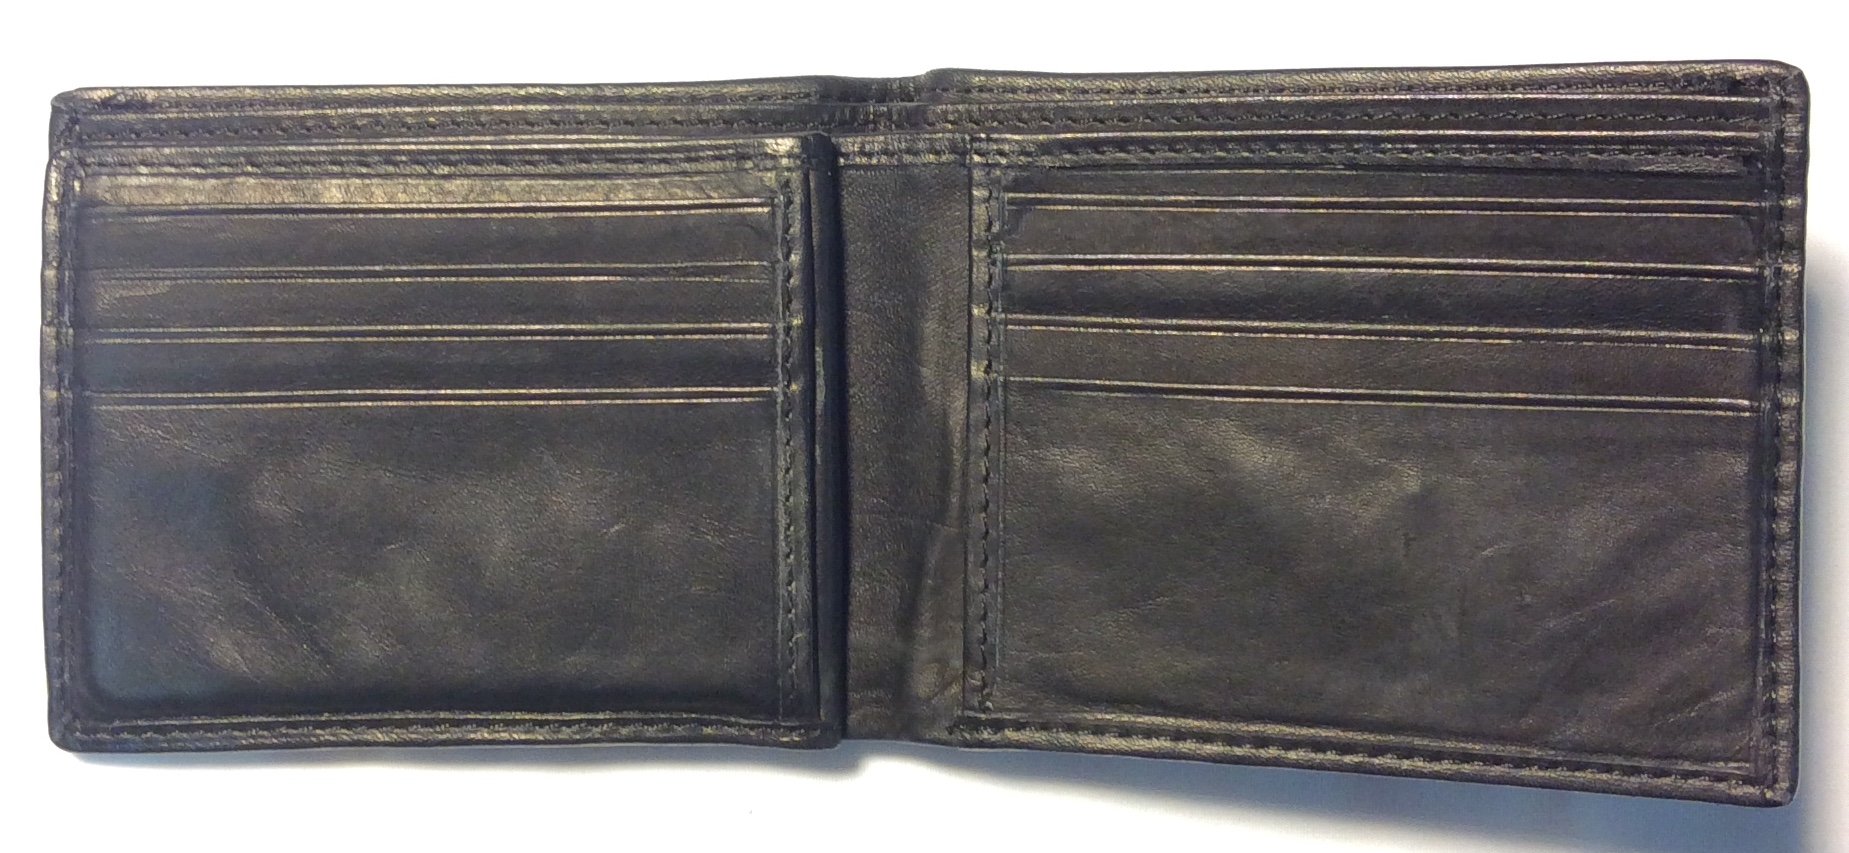 Black leather w/ small black stitch